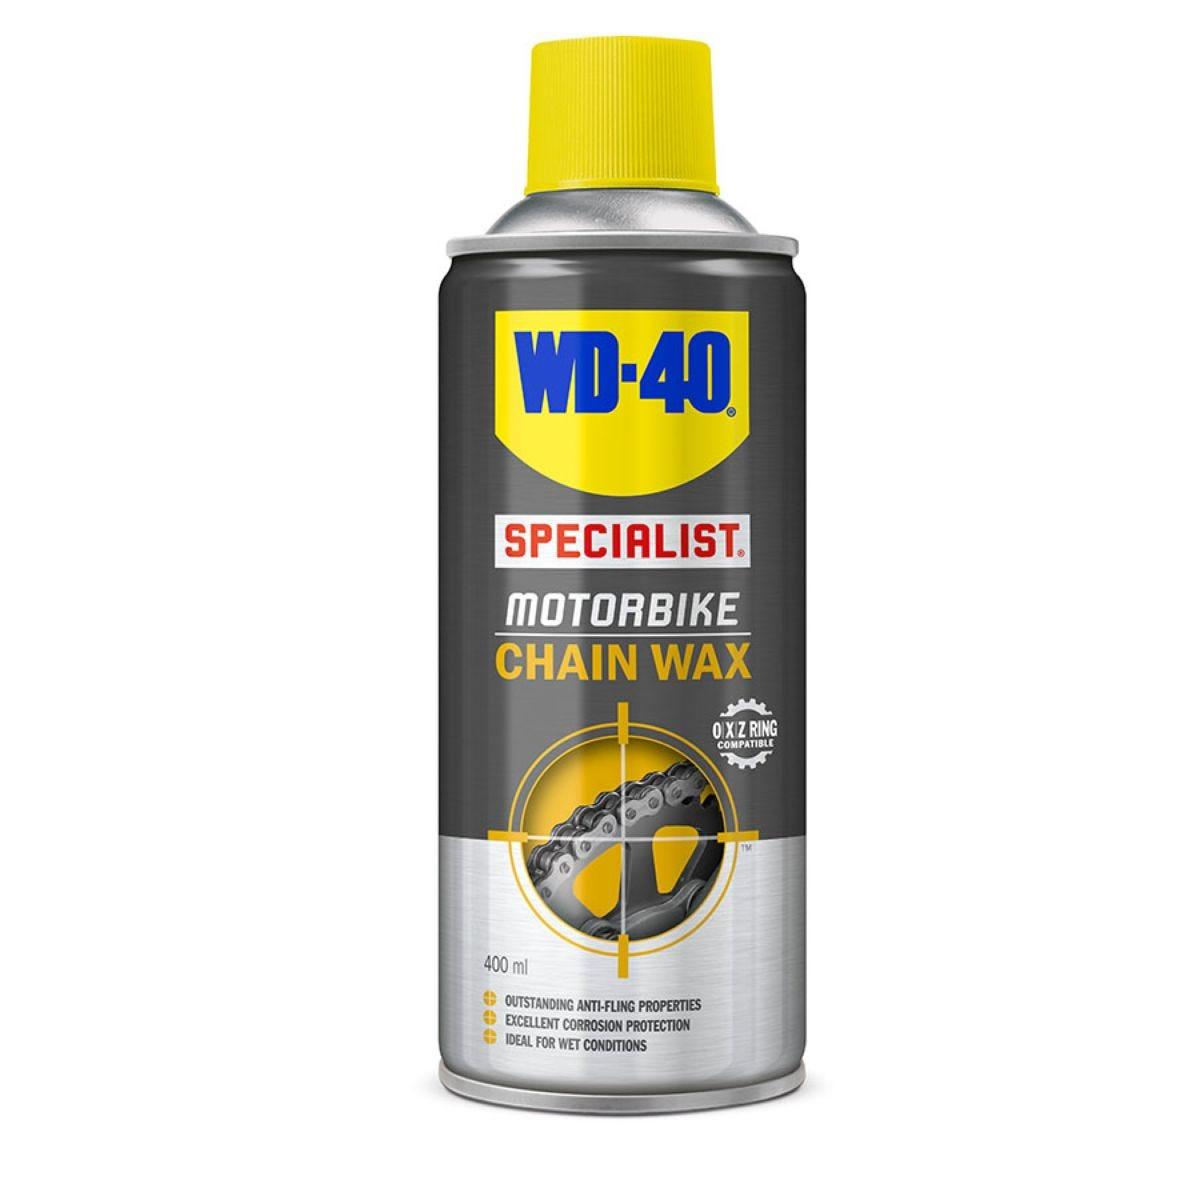 WD-40 Specialist Motorbike Chain Wax – 400ml